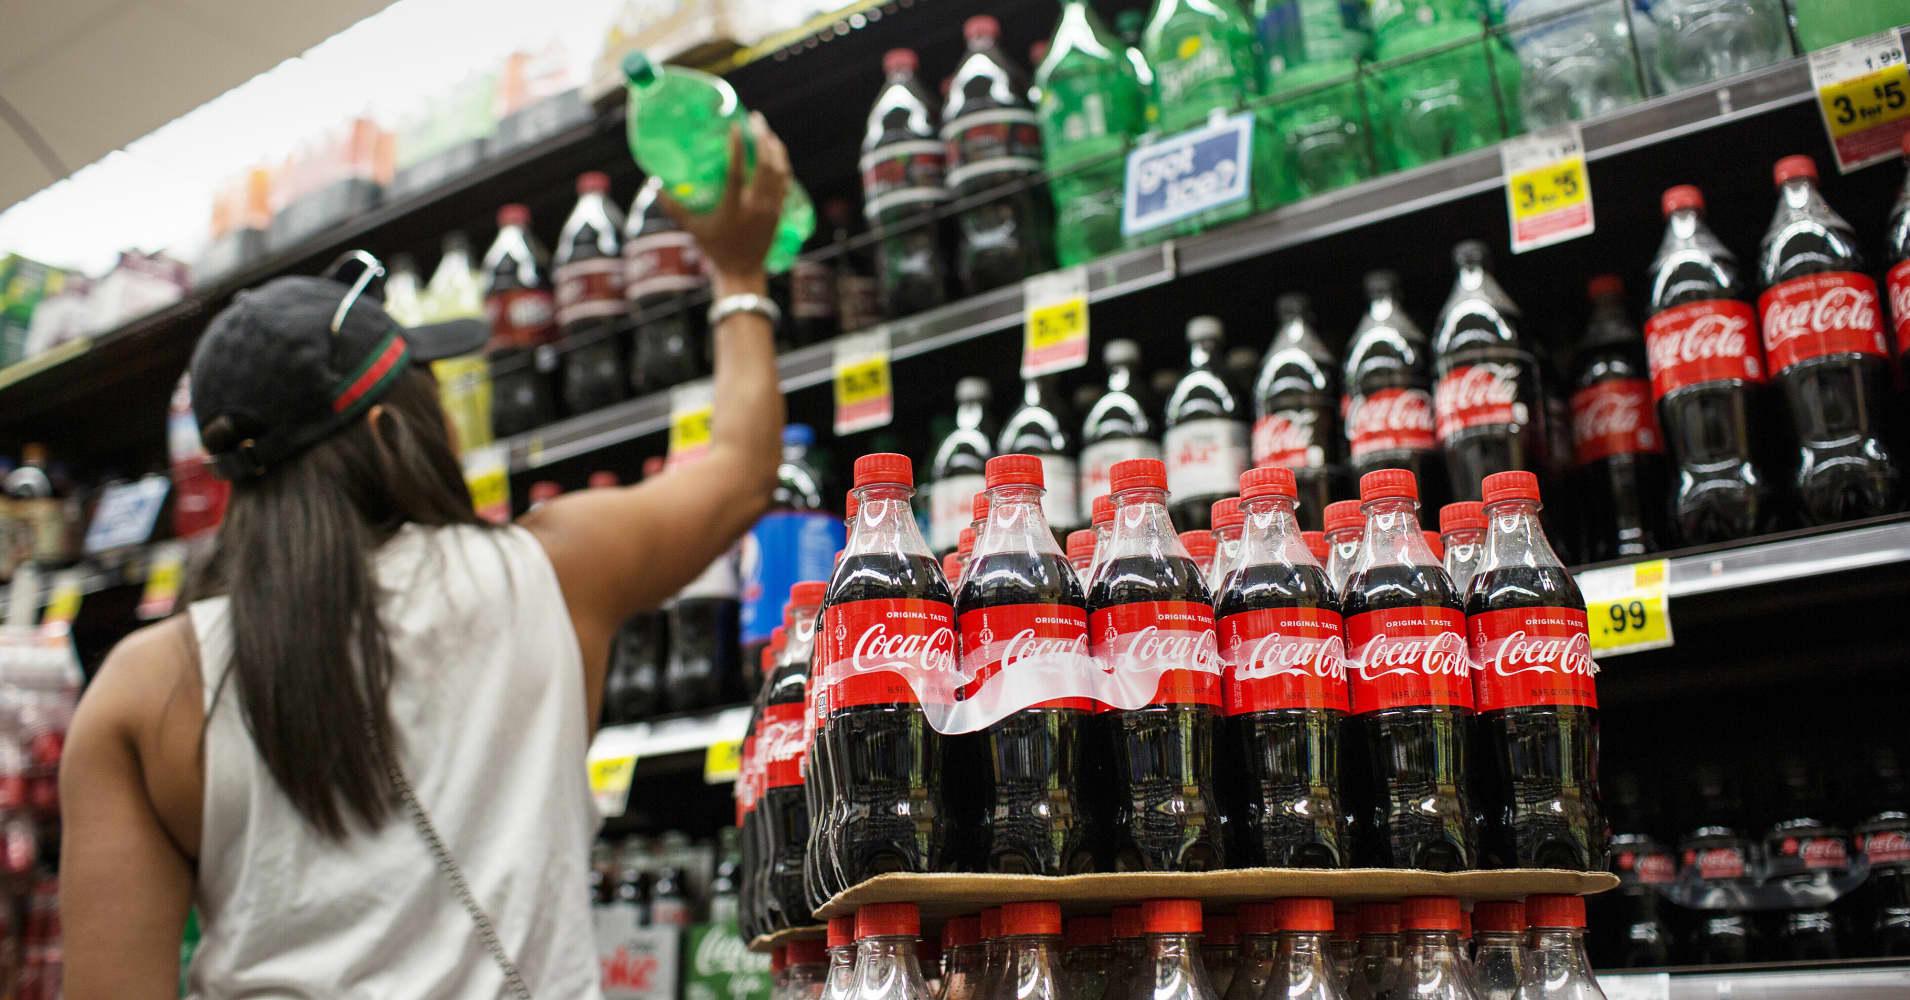 California soda tax bill shelved, in reprieve for beverage industry